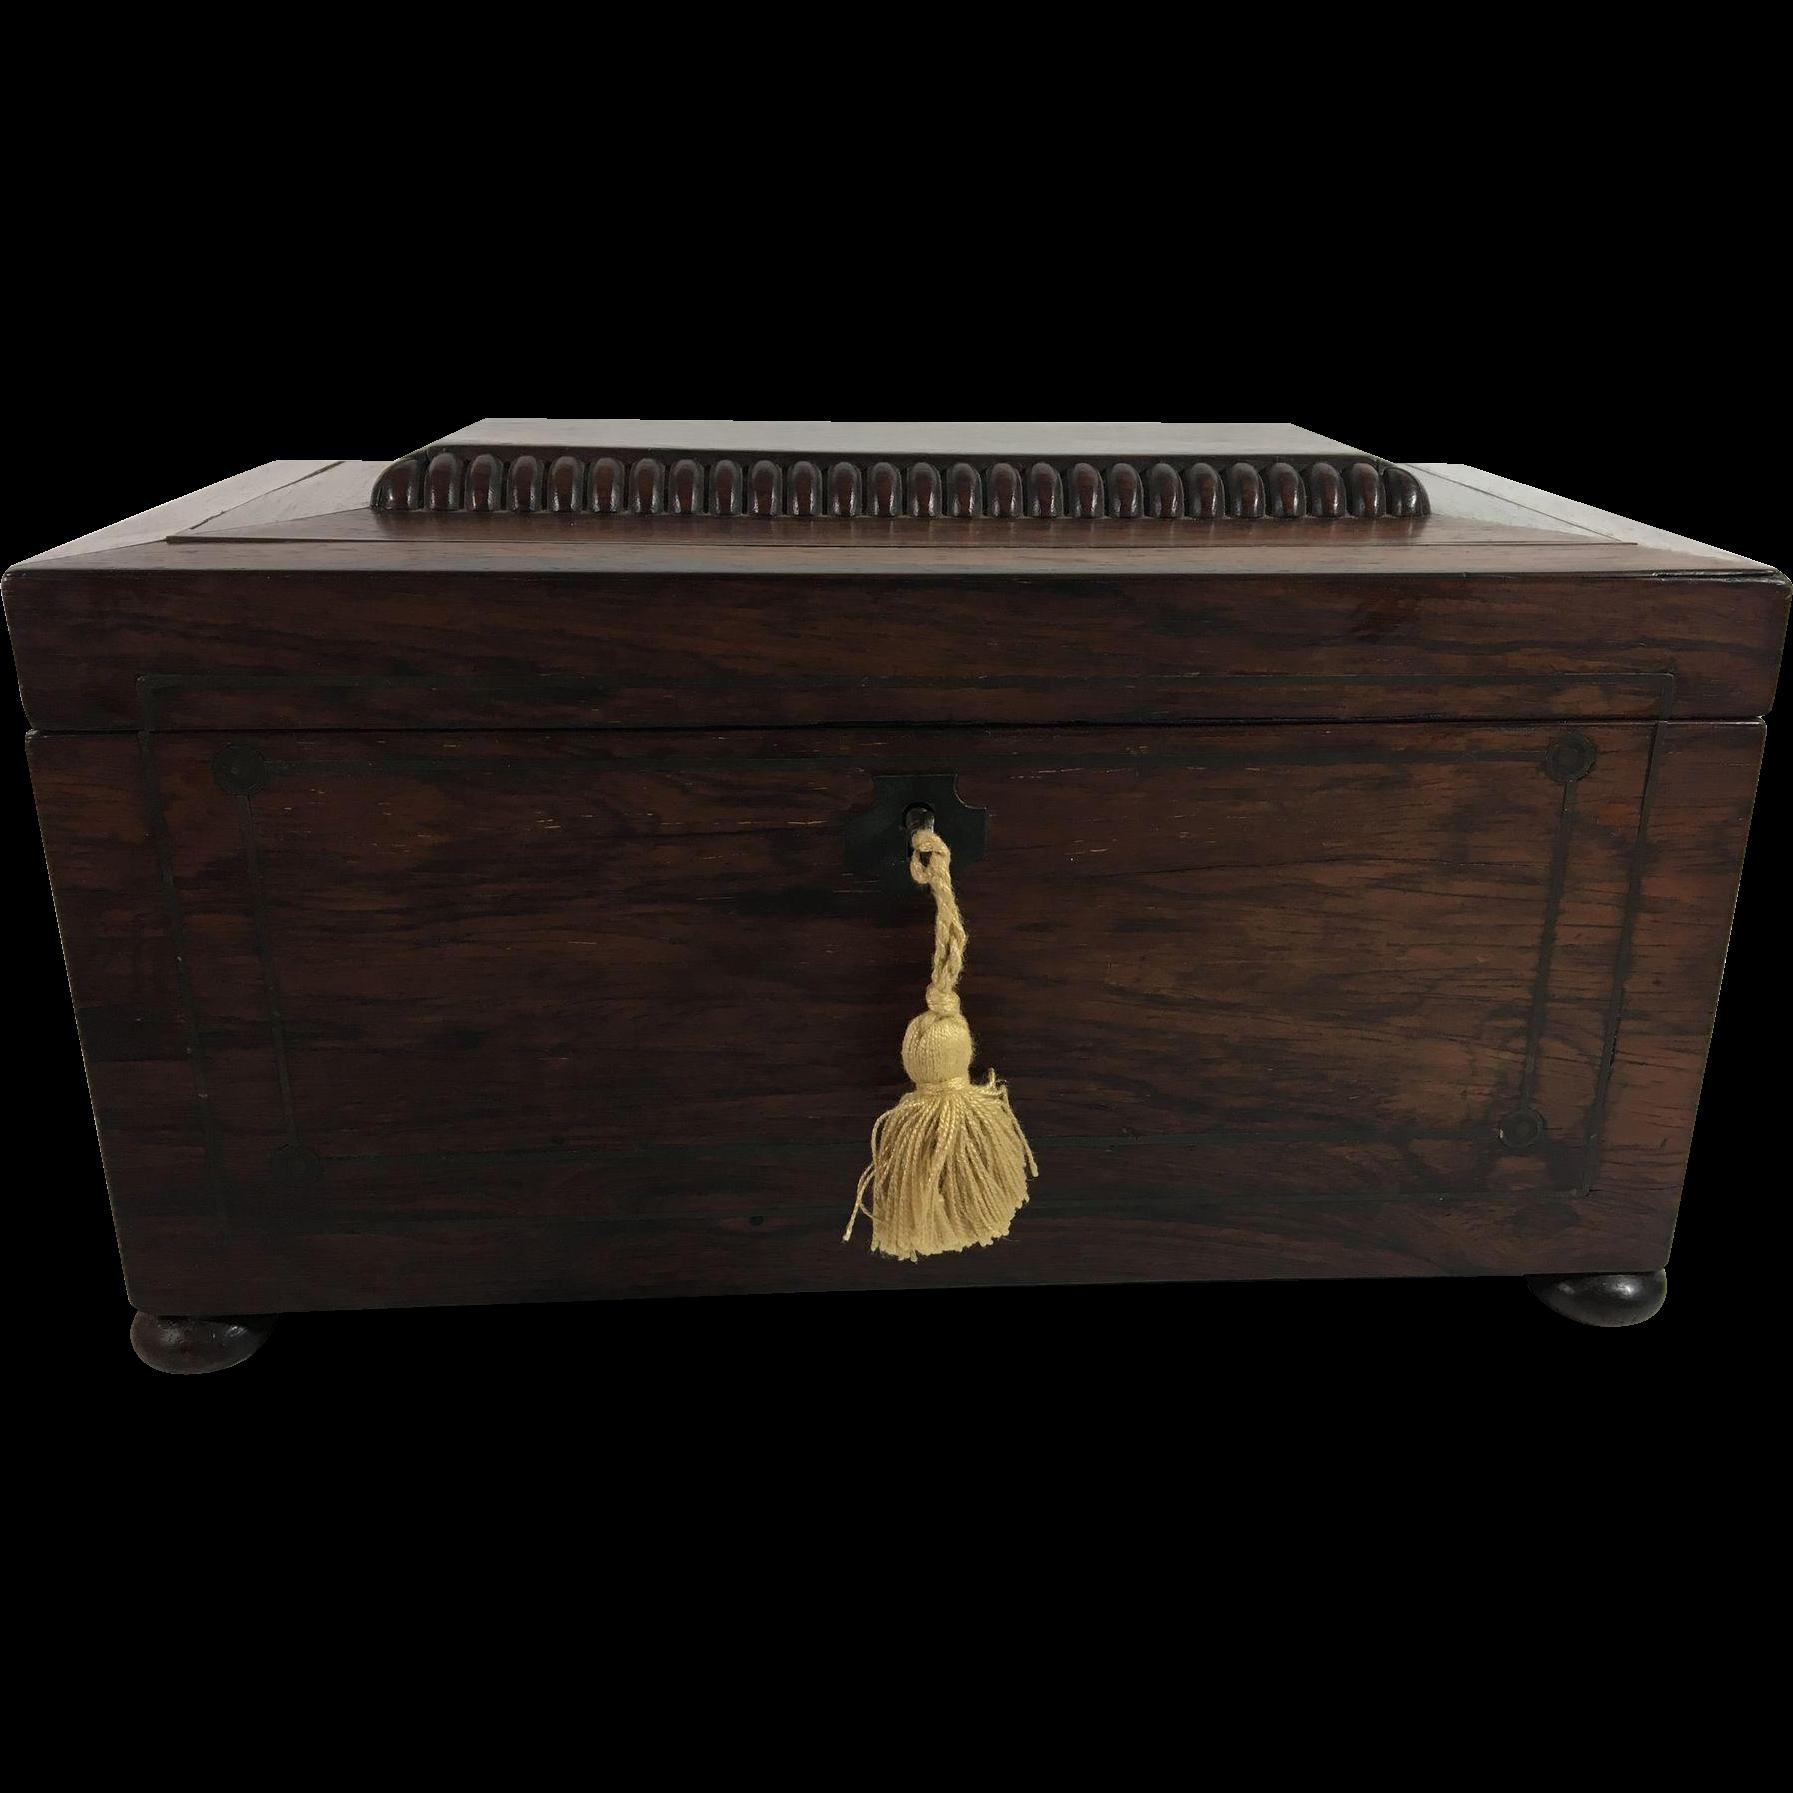 English Sarcophagus-Shaped Mahogany Tea Caddy, c. 1860